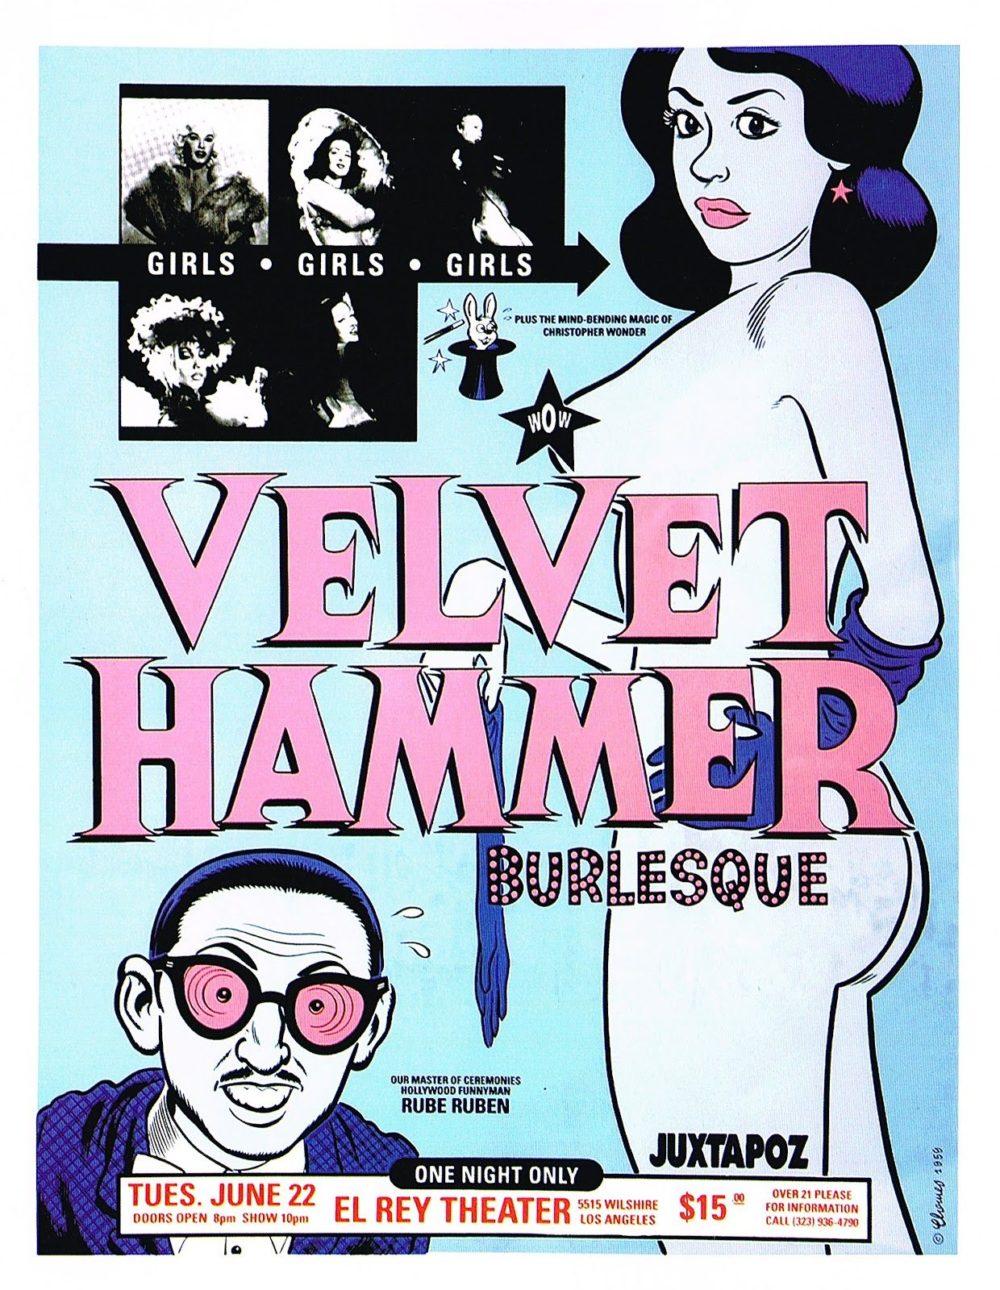 The Velvet Hammer Burlesque no El Rey Theater, por Daniel Clowes